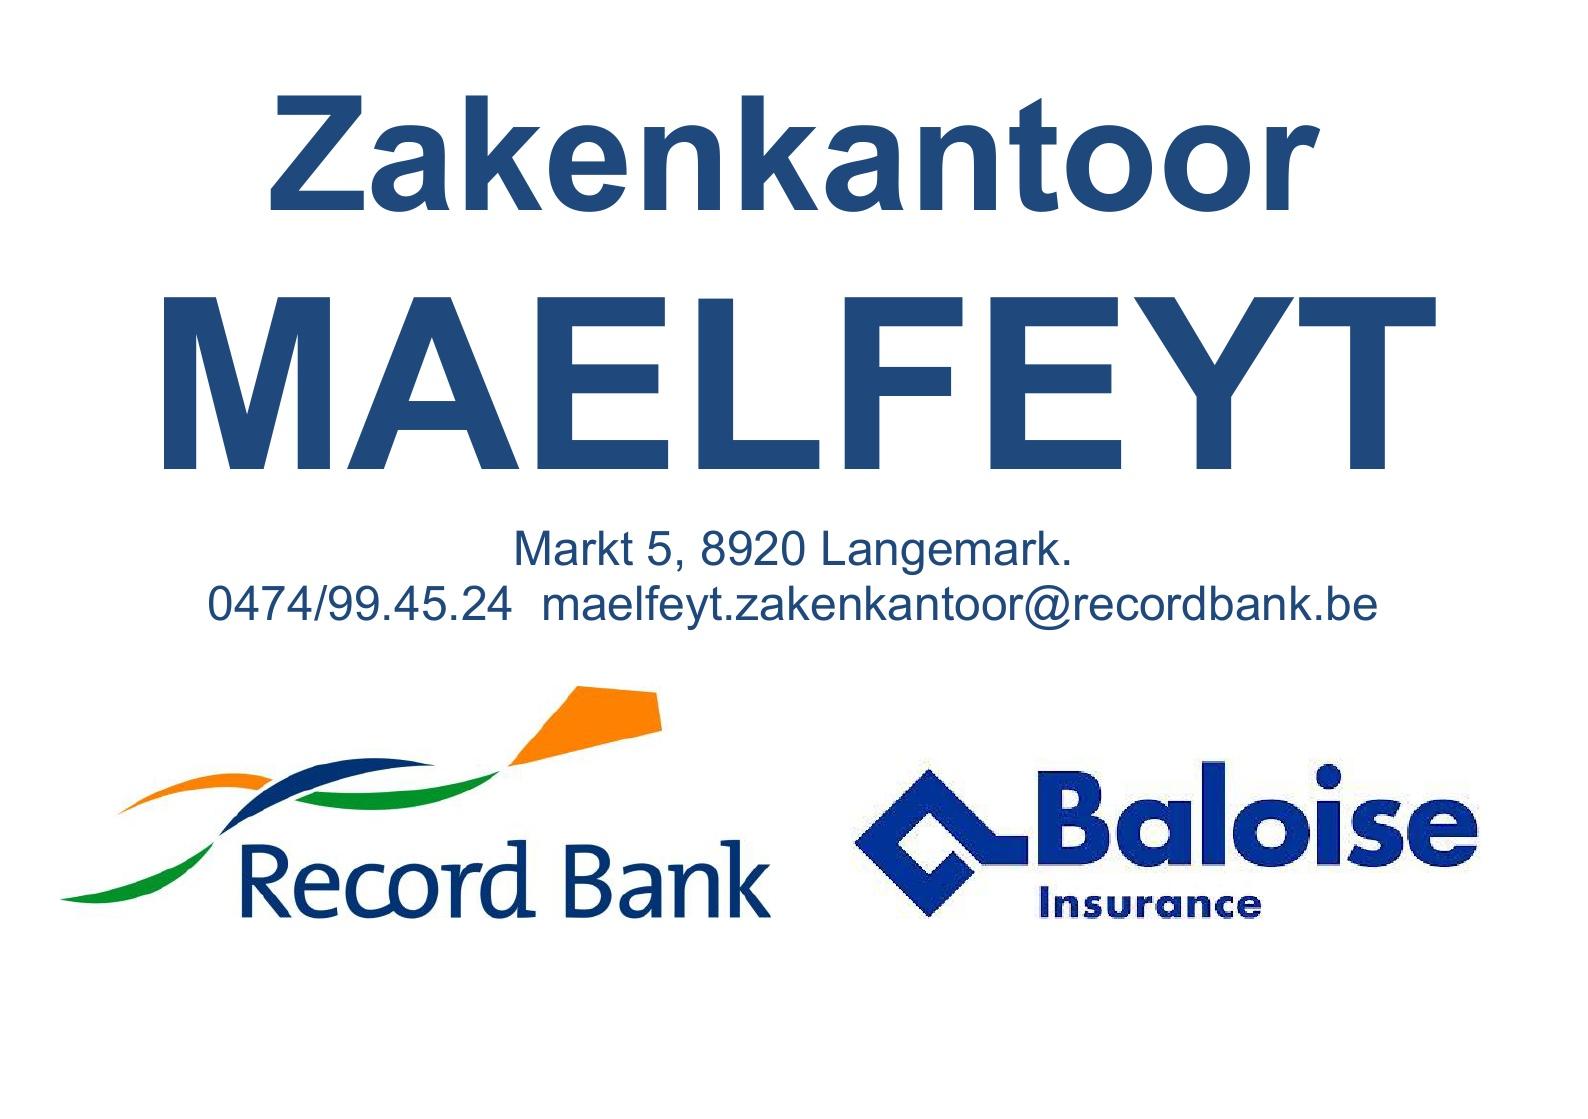 Zakenkantoor Maelfait